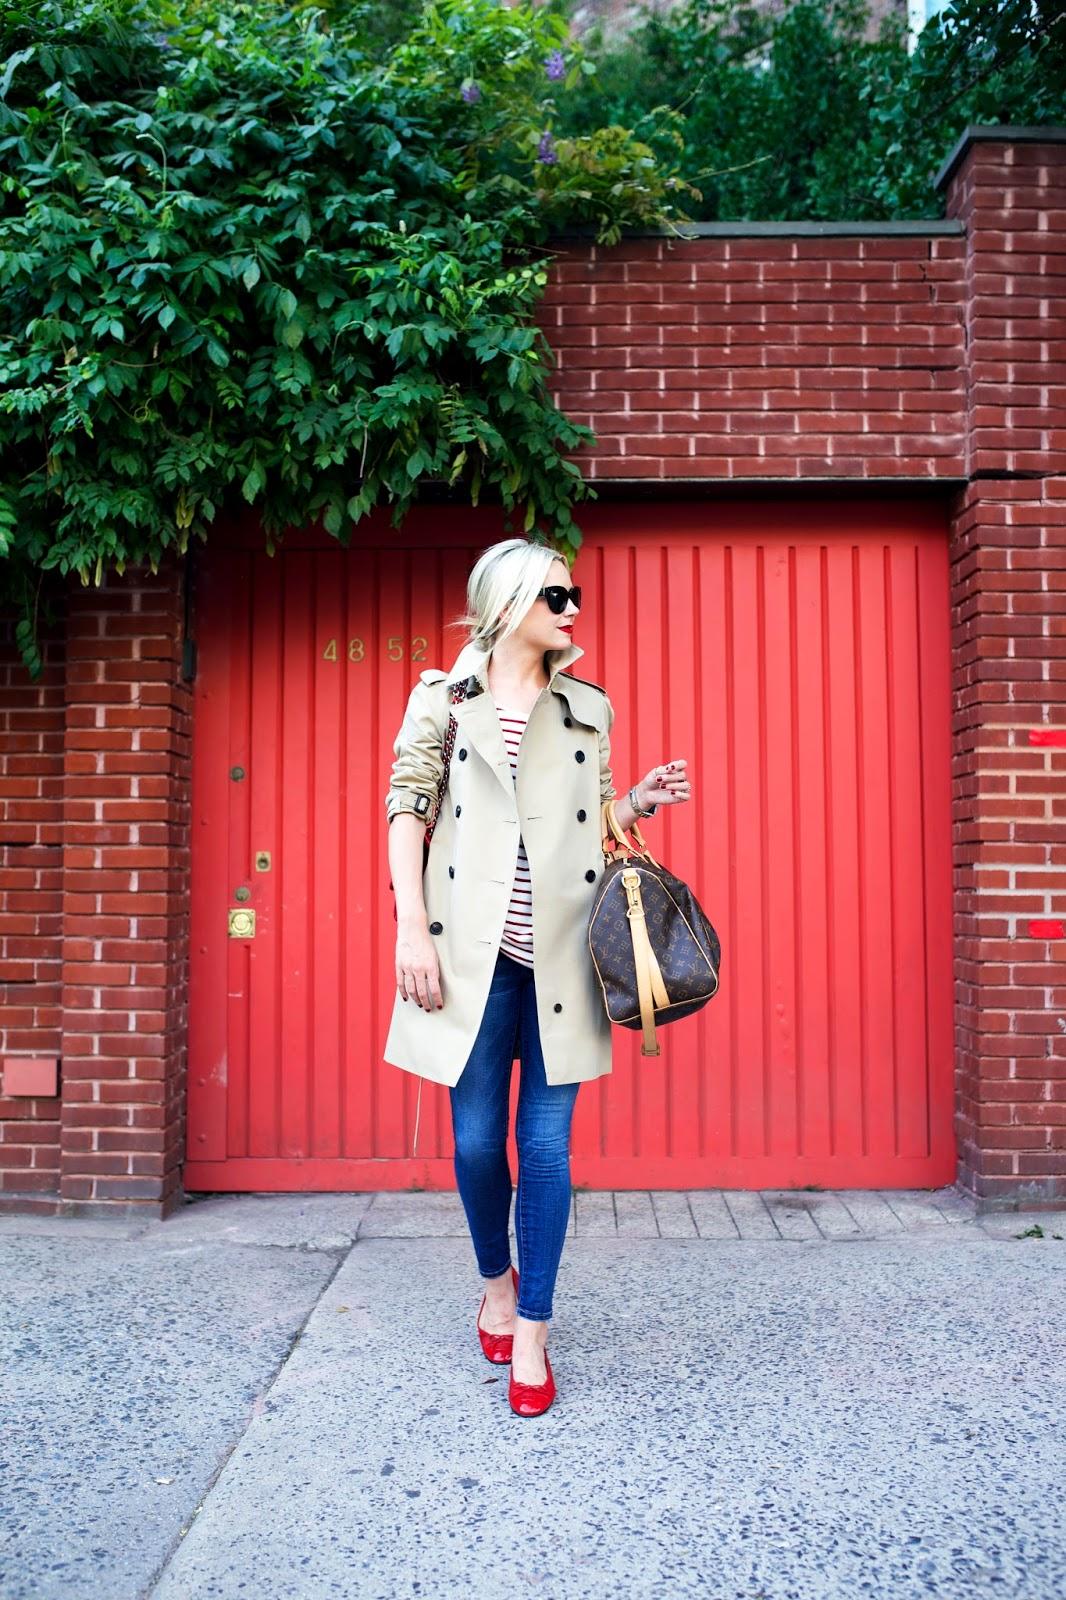 Lady wearing thigh length tan jacket